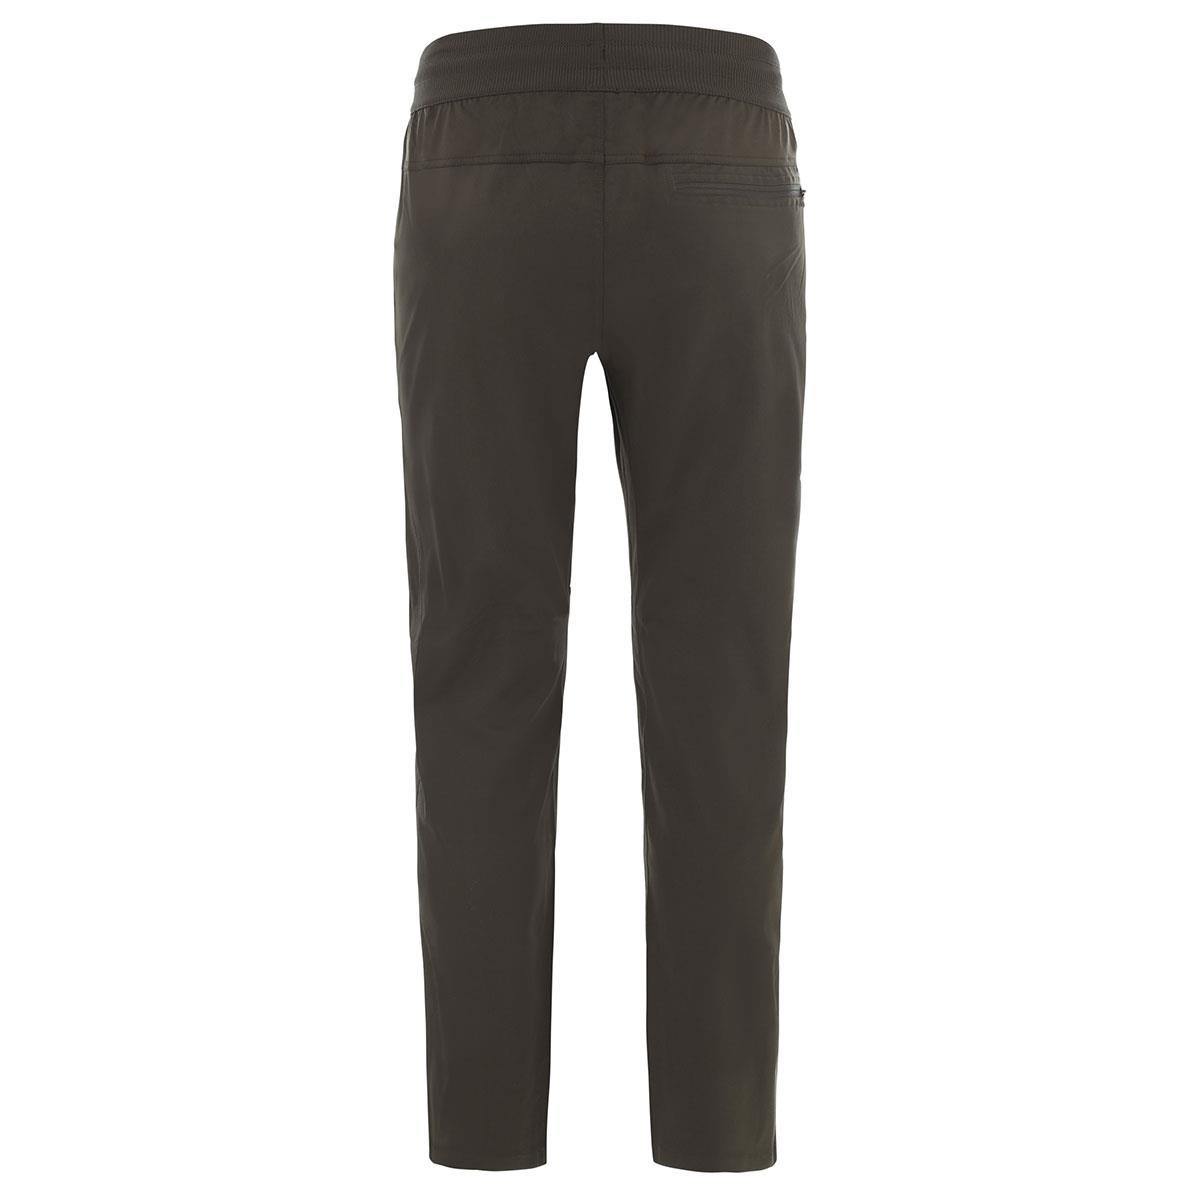 The Northface Kadın APHRODITE MOTION Pantolon NF0A4AQD21L1